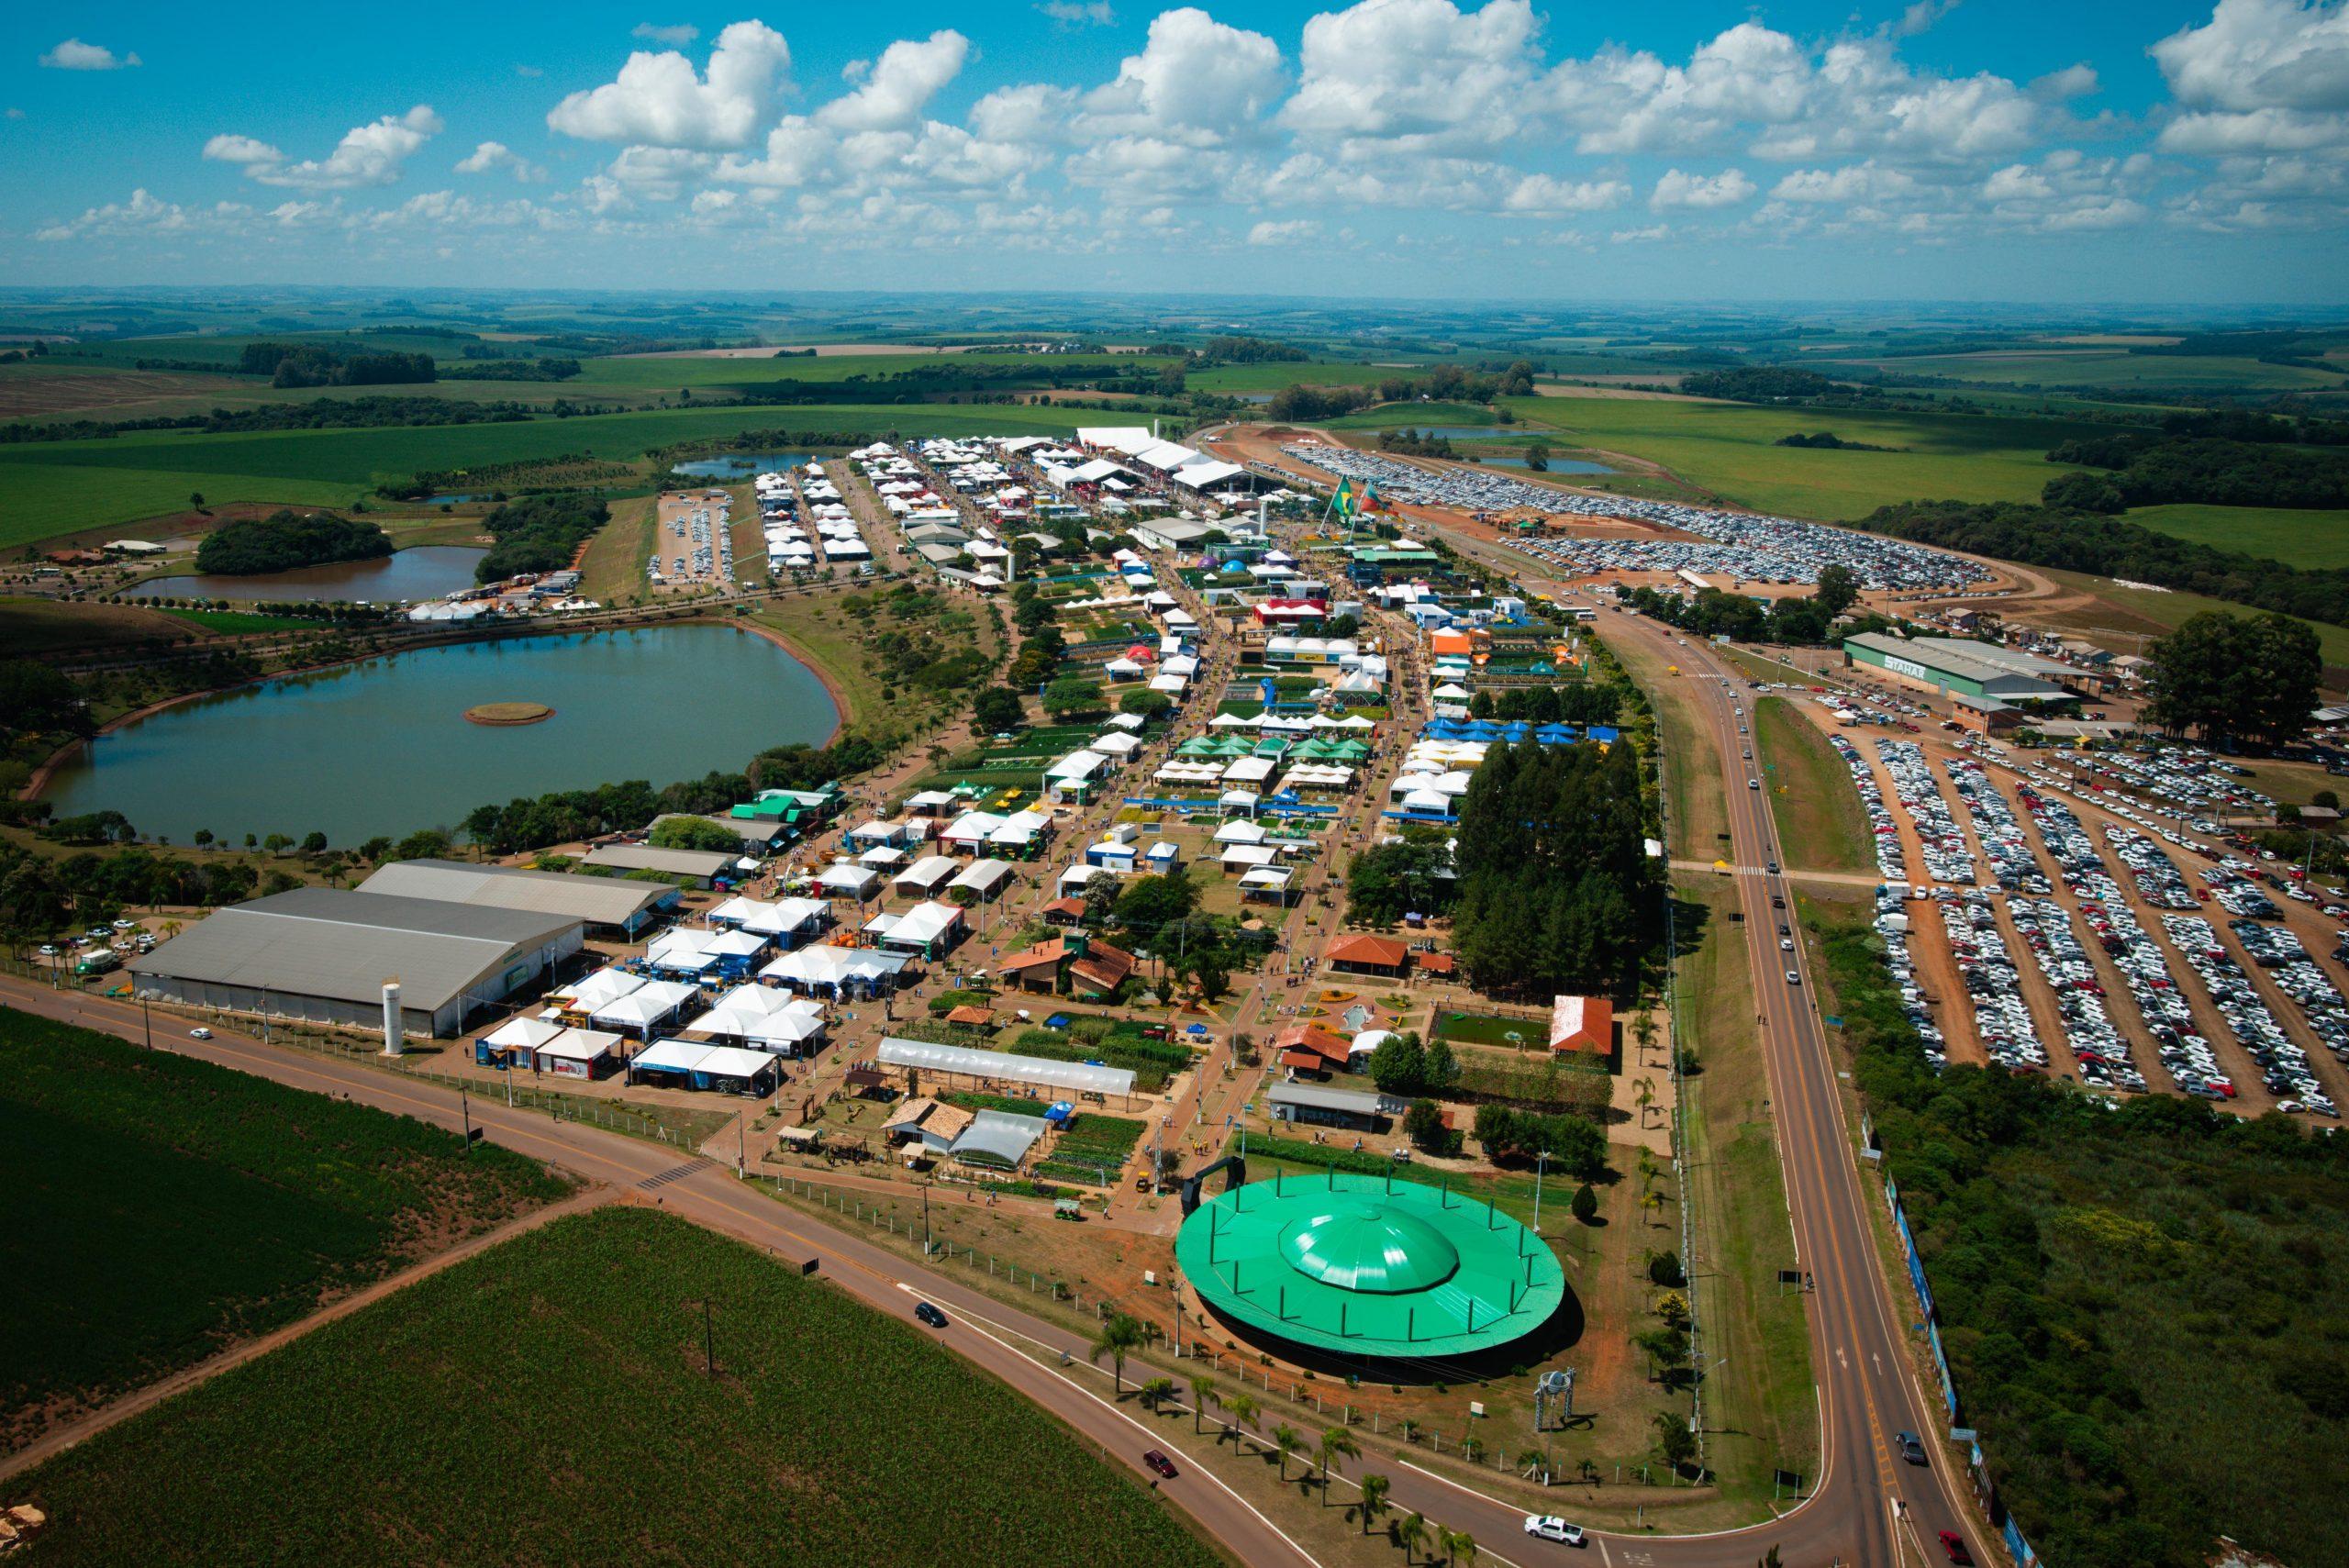 Cotrijal intensifica preparativos para a Expodireto 2022